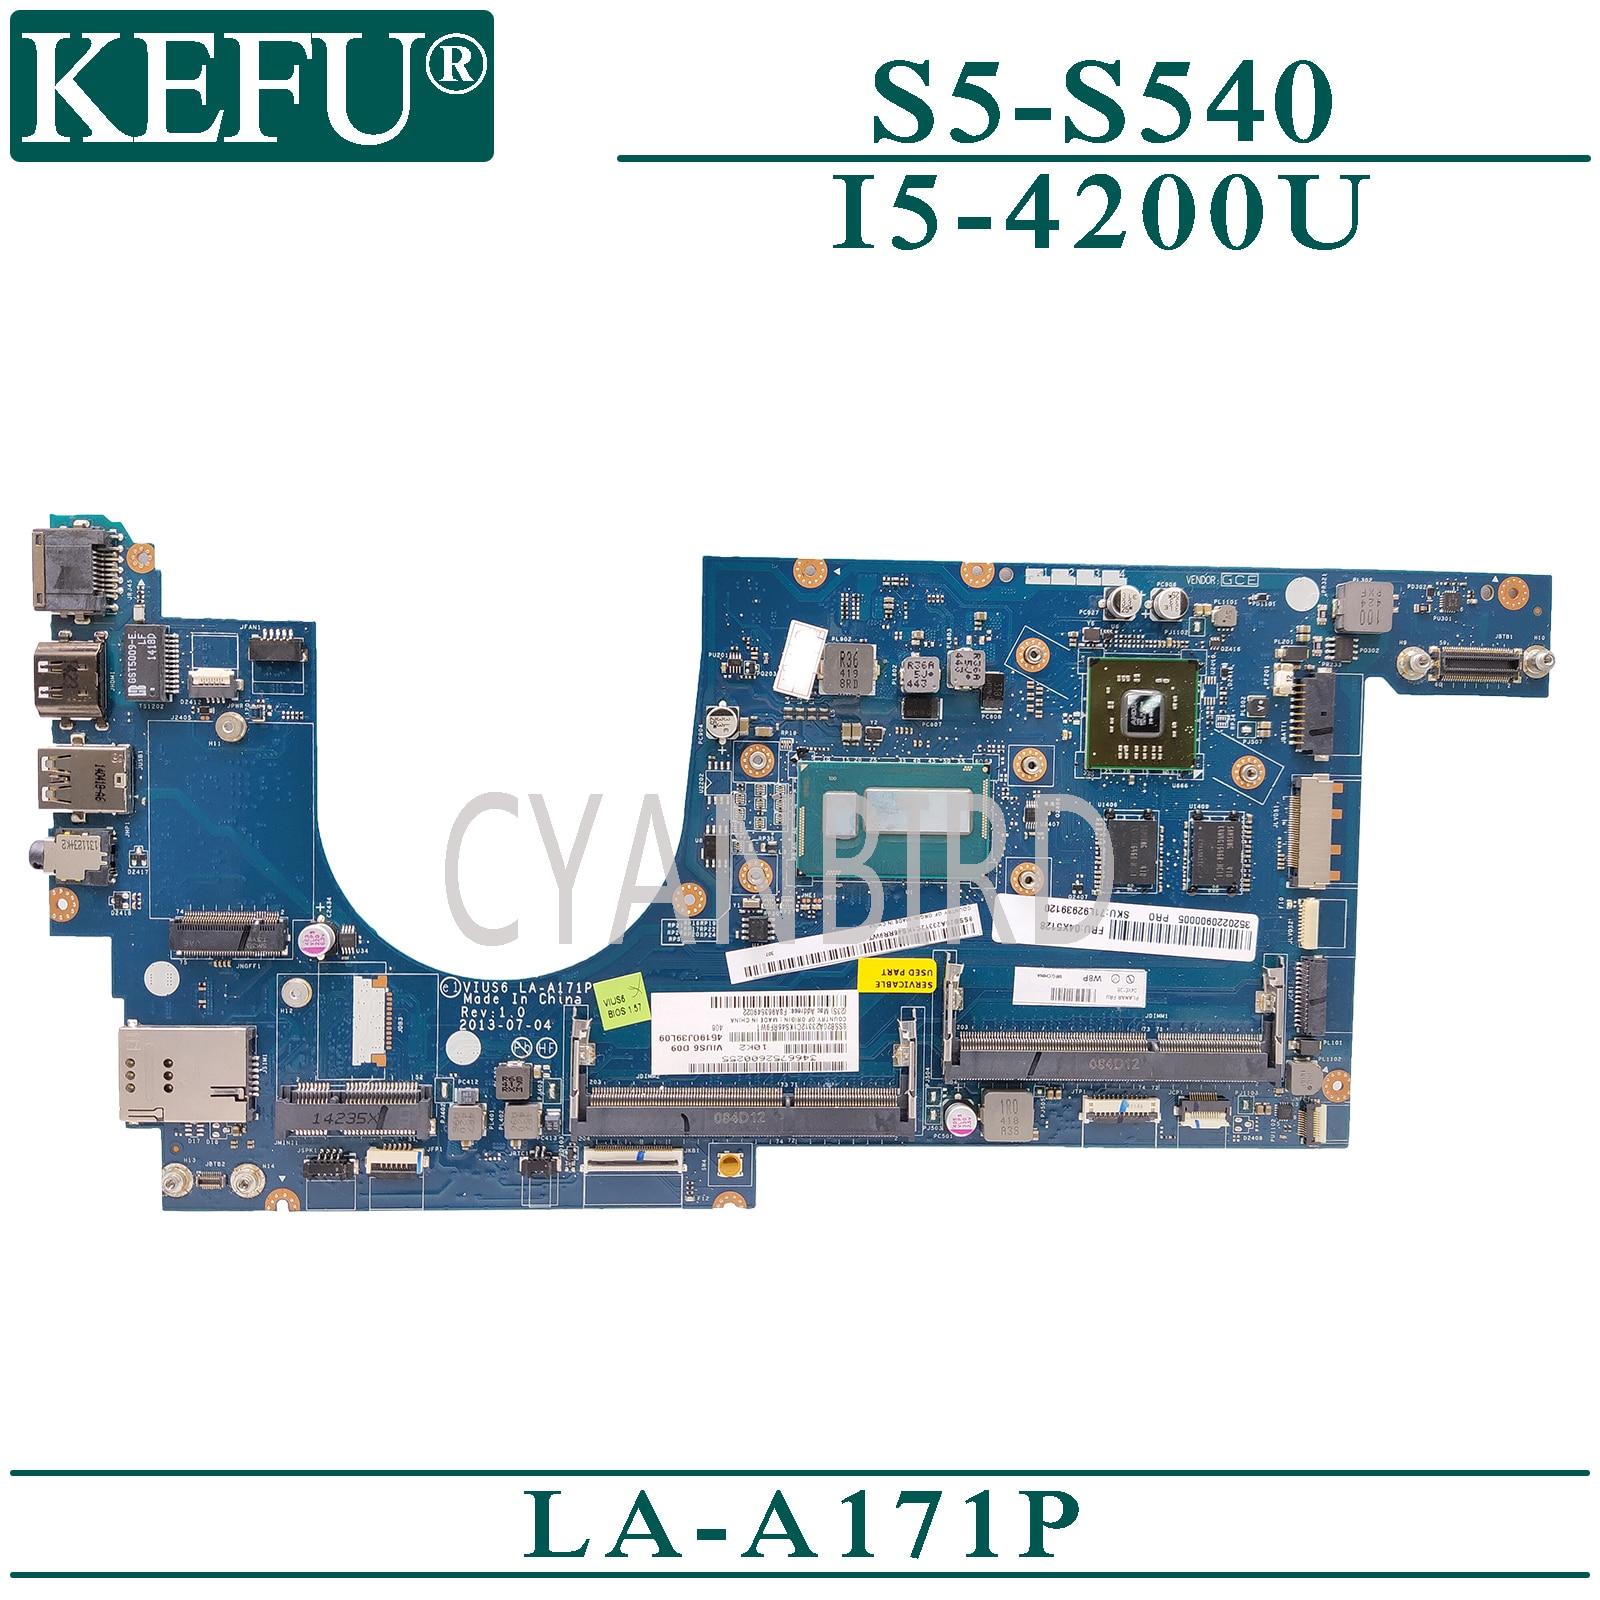 KEFU LA-A171P اللوحة الرئيسية الأصلية لينوفو ثينك باد S5-S540 مع I5-4200U AMD-فيديو اللوحة الأم للكمبيوتر المحمول